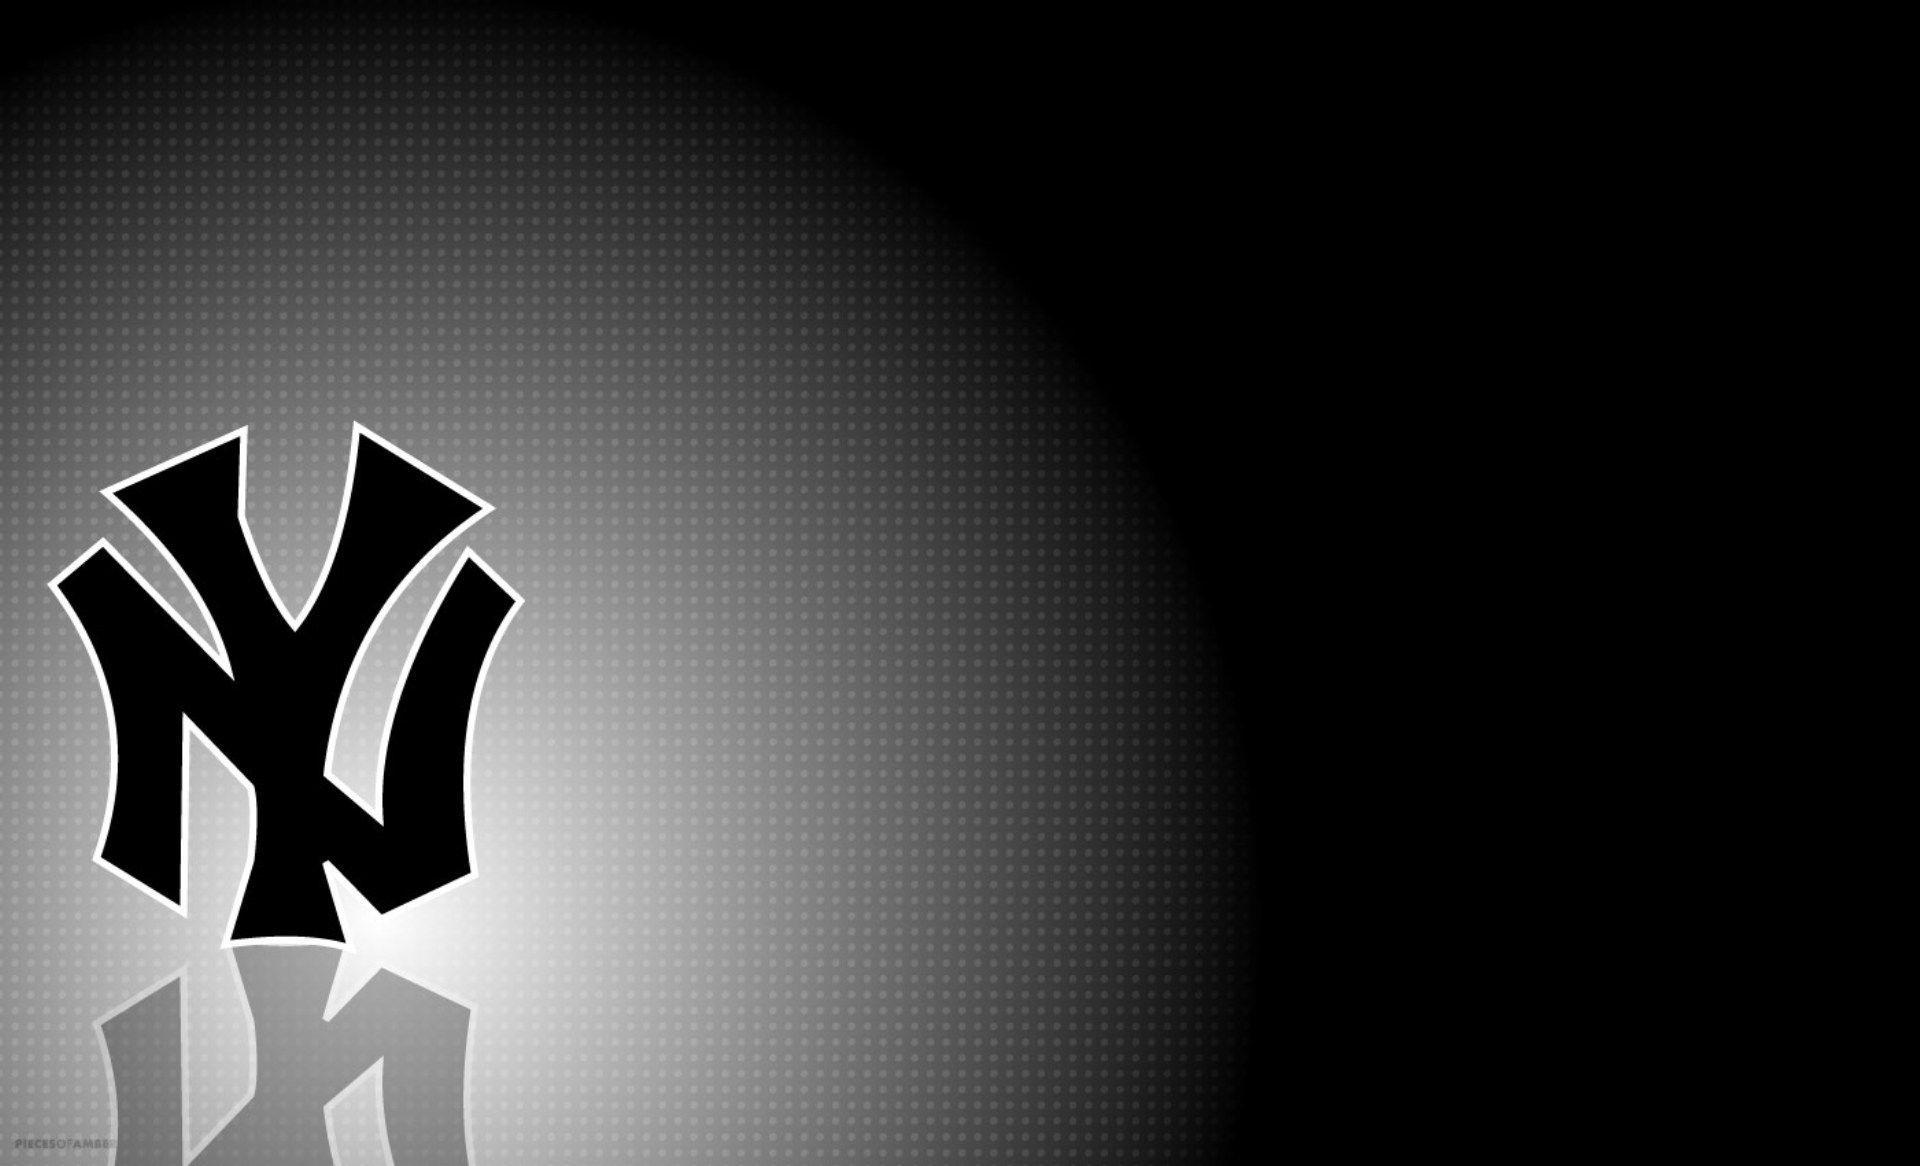 Ny yankee screensavers and wallpapers 20001250 free yankees ny yankee screensavers and wallpapers 20001250 free yankees wallpapers 37 wallpapers voltagebd Choice Image